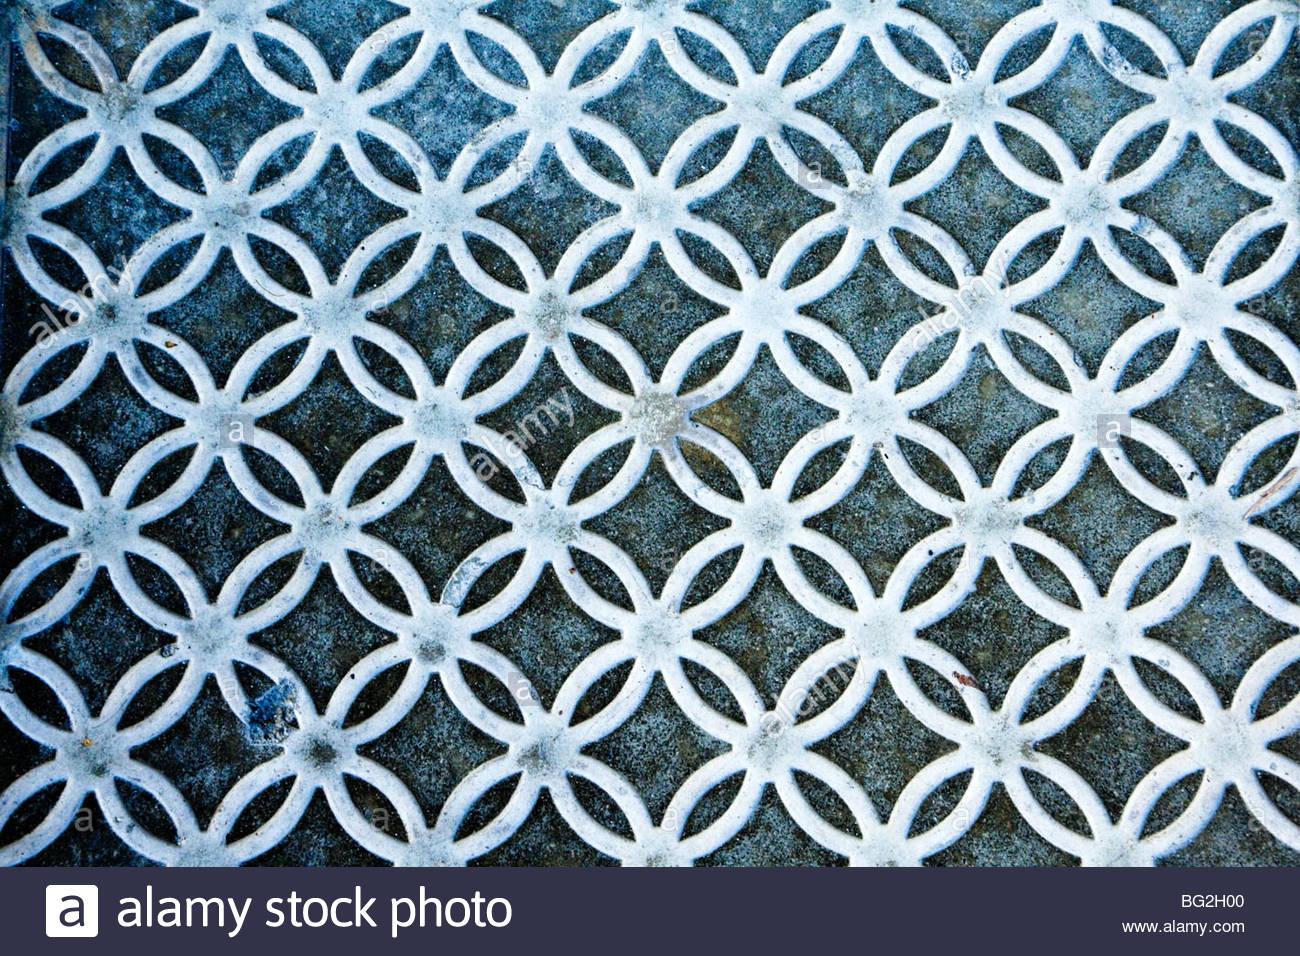 tile patterns stock photos tile patterns stock images alamy